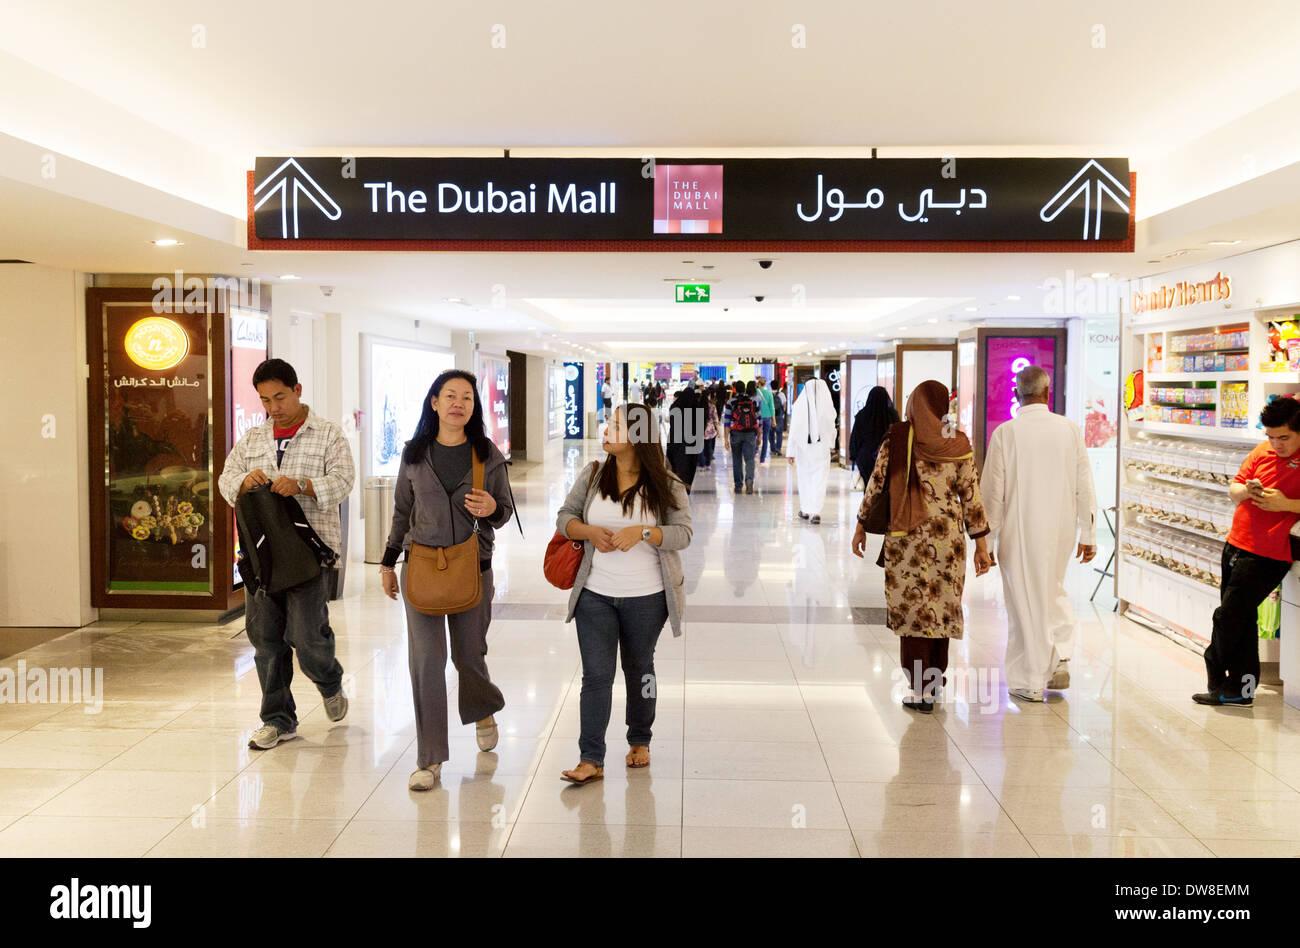 People at the entrance to the Dubai Mall with sign, Dubai, UAE, United Arab Emirates Middle East - Stock Image